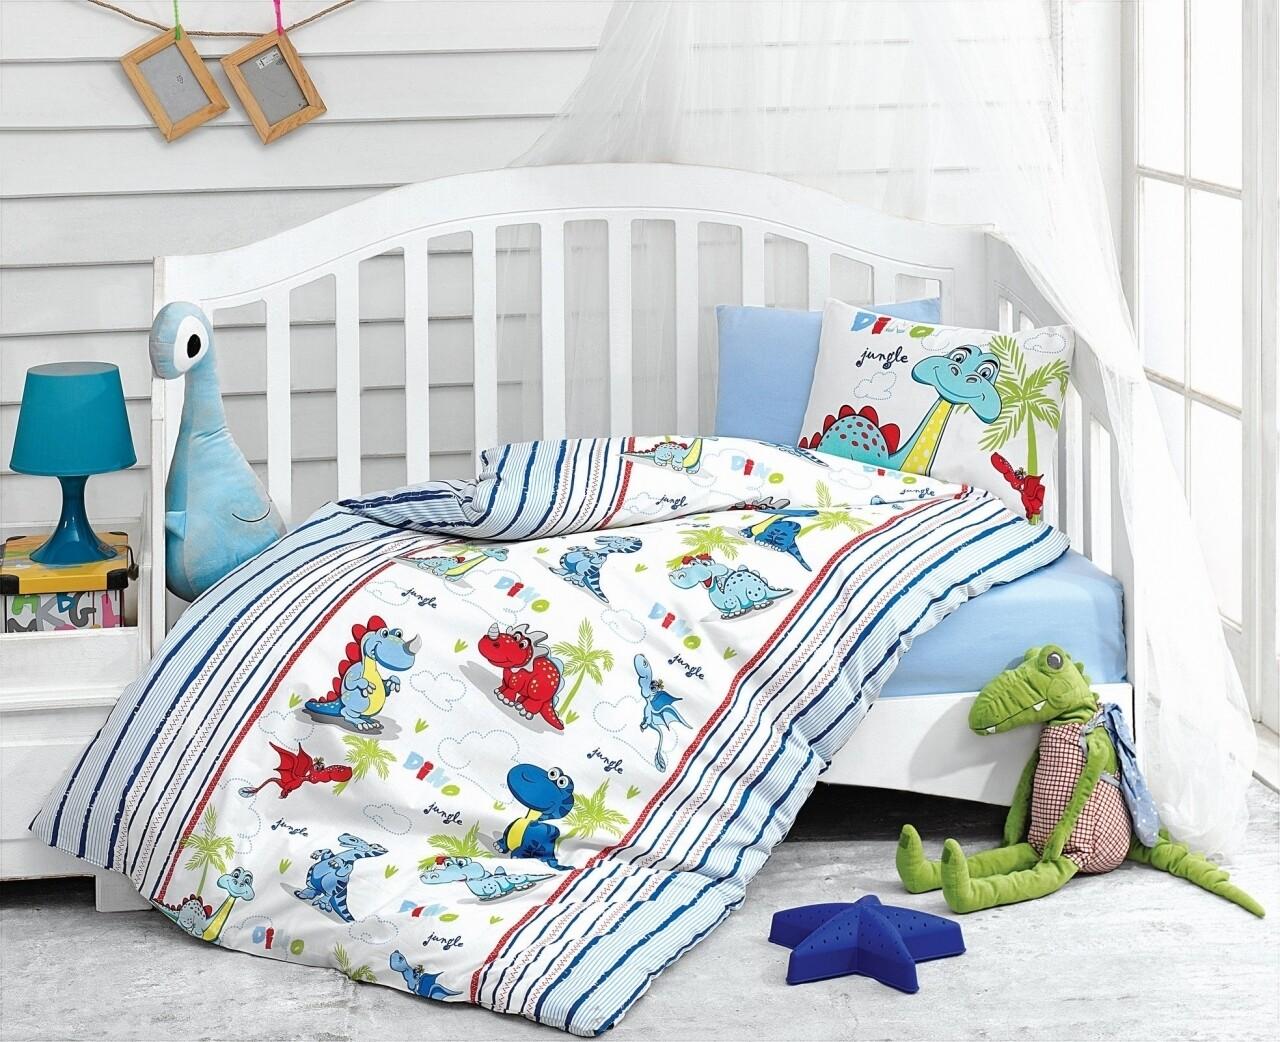 Lenjerie de pat pentru copii, 4 piese, 100% bumbac ranforce, Cotton Box, Dinozauri